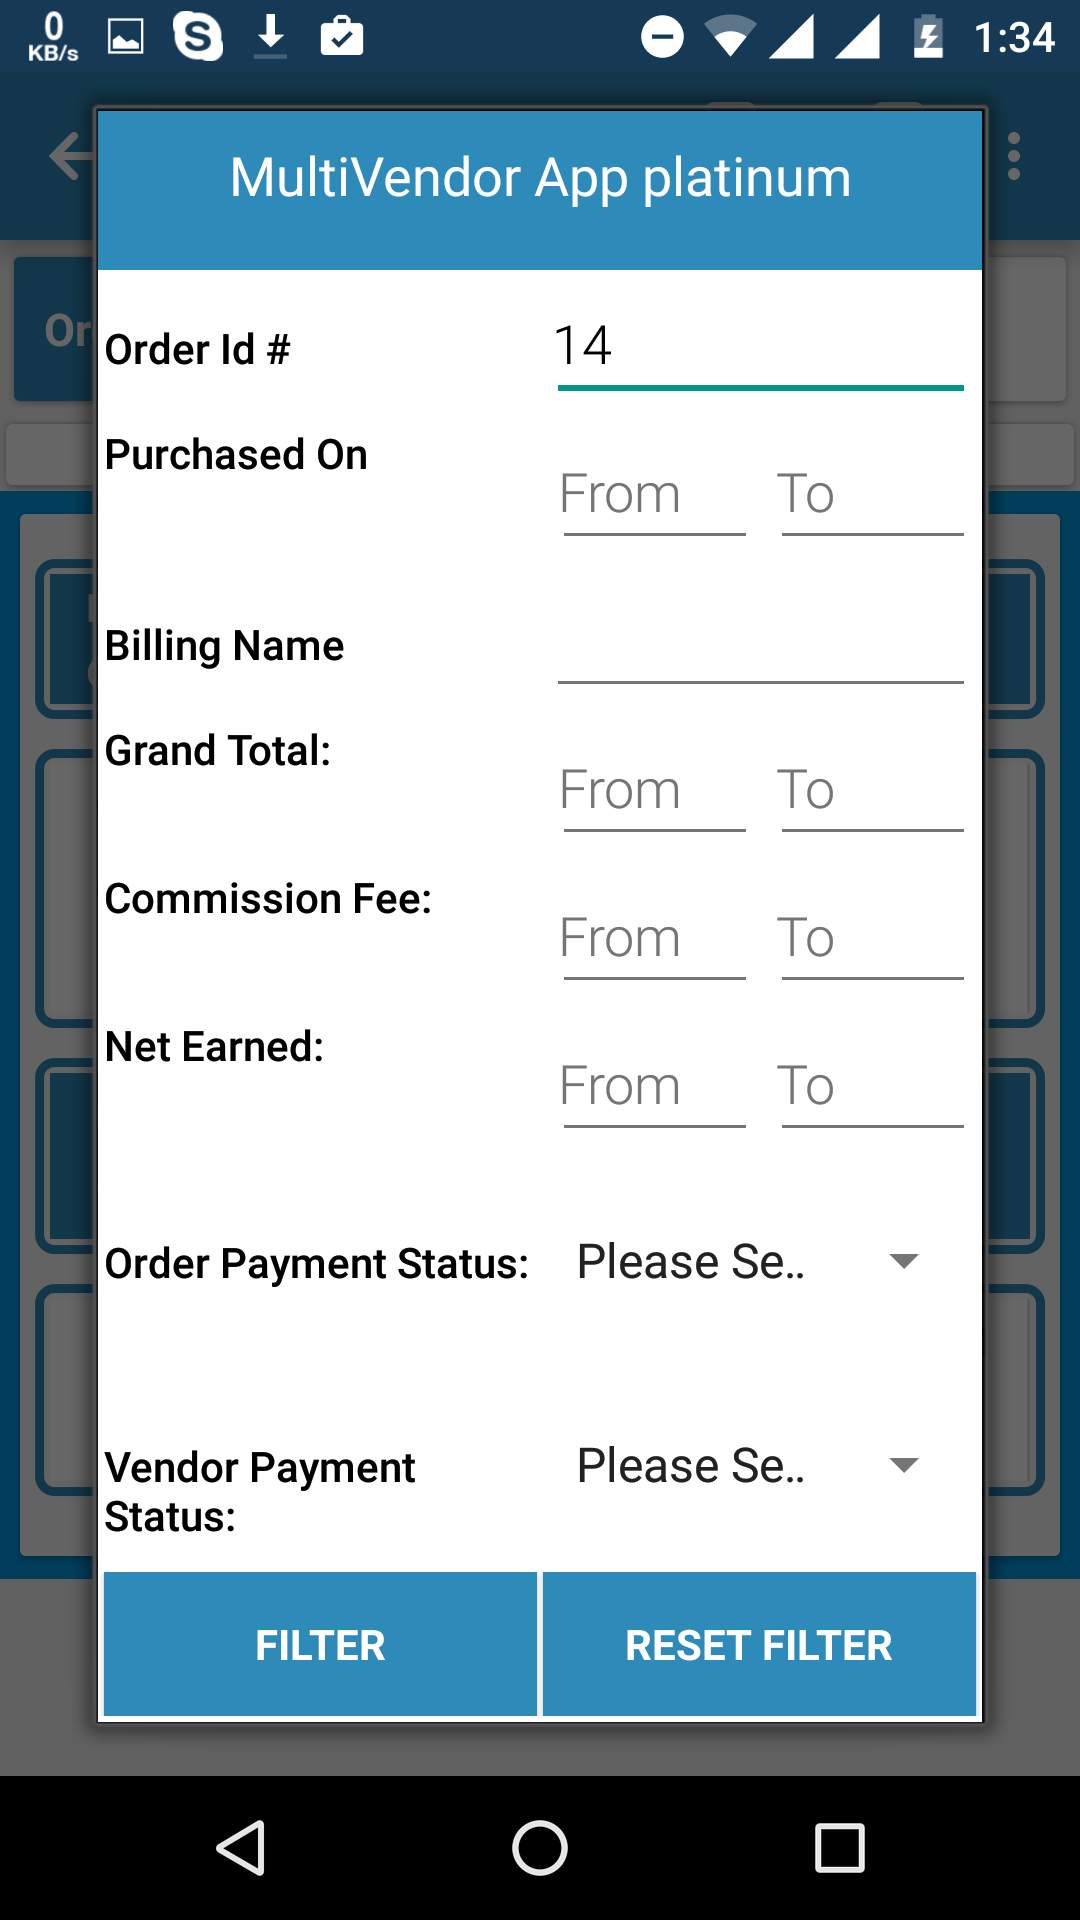 multivendor_orderfilter